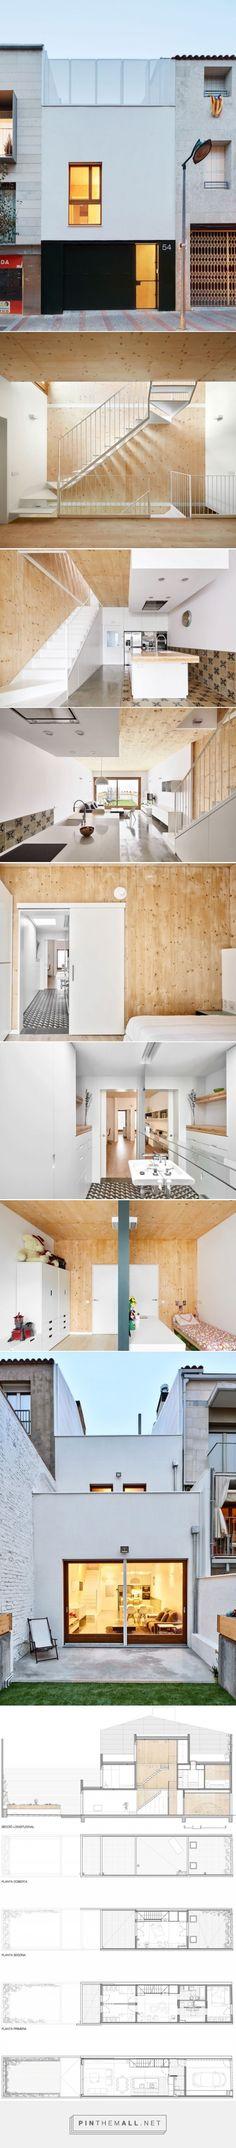 Vallribera Arquitectes > Casa entre mitgeres al Centre de Terrassa | HIC Arquitectura http://hicarquitectura.com/2016/01/vallribera-arquitectes-casa-entre-mitgeres-al-centre-de-terrassa/ - created via https://pinthemall.net